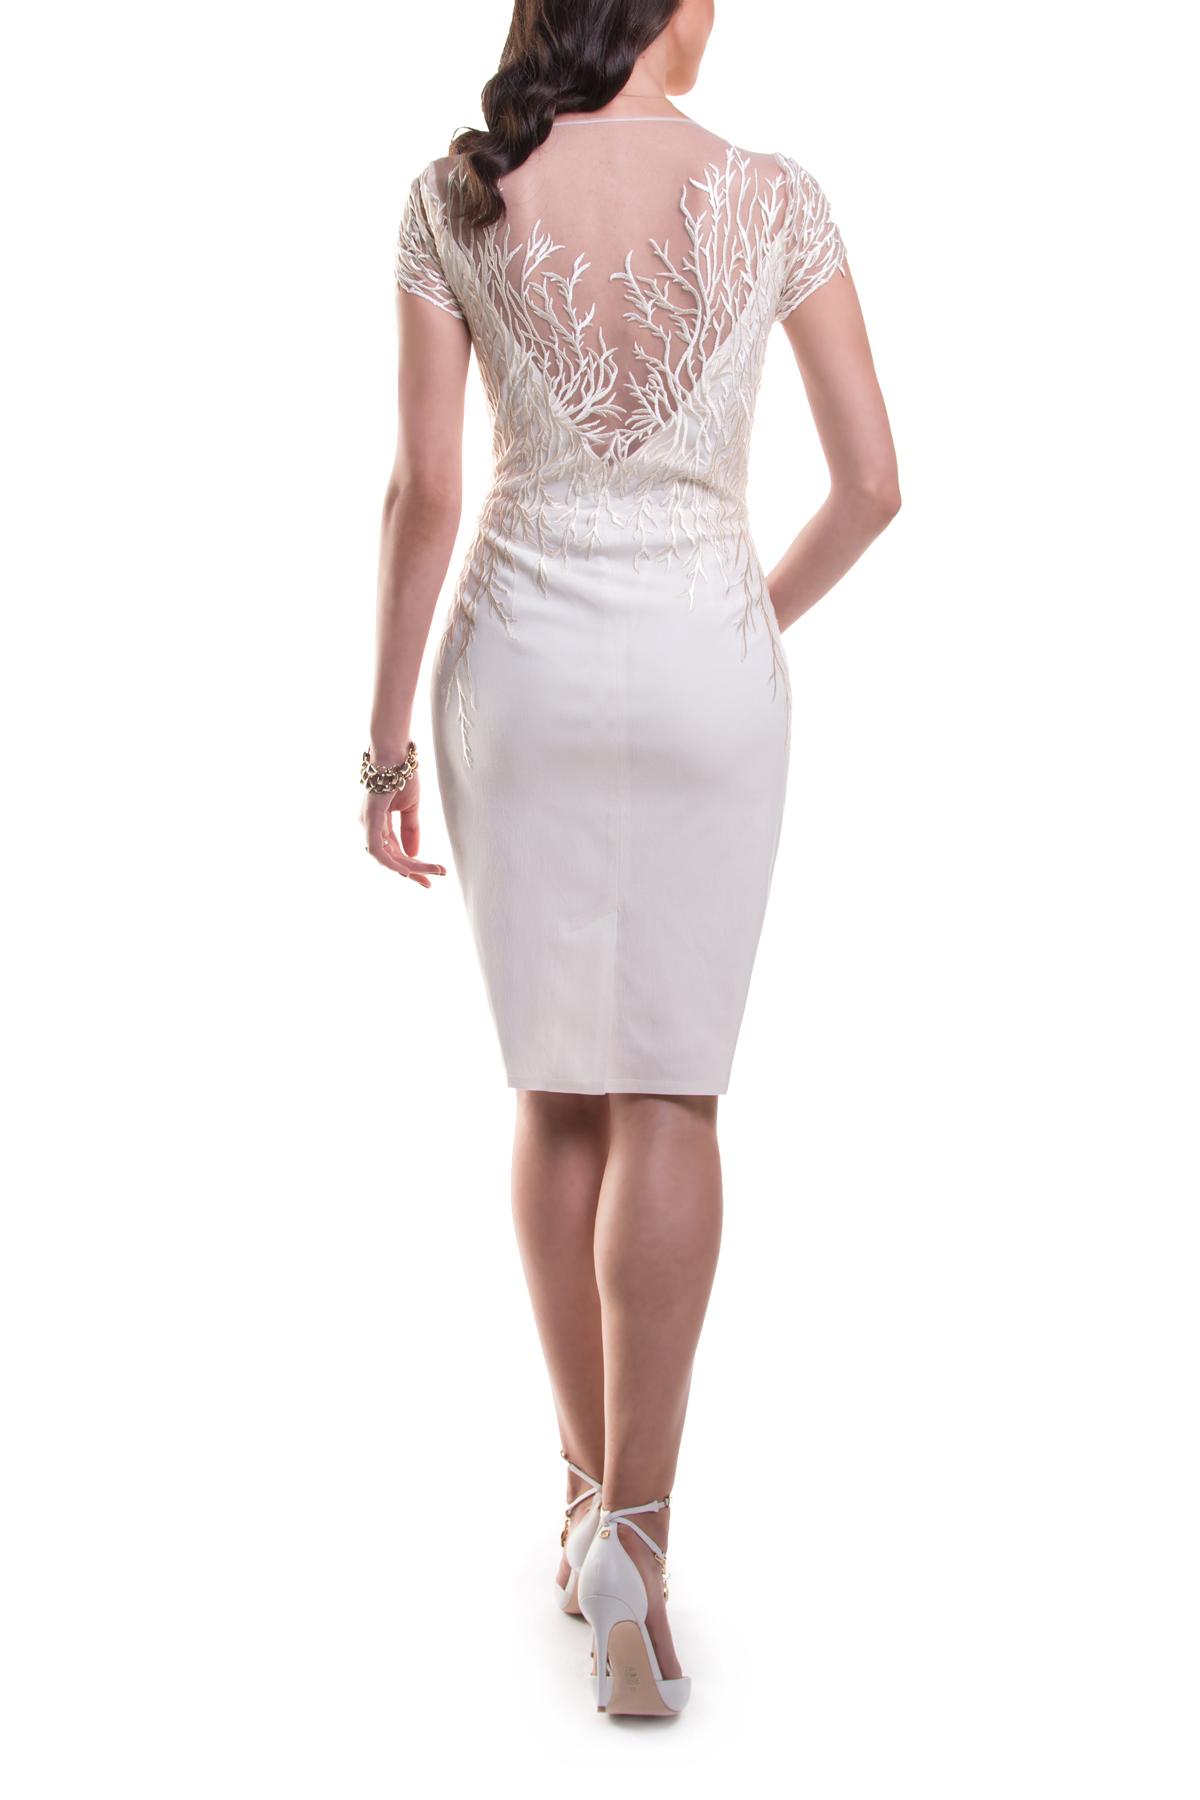 NARROW DRESS DALIJA 2